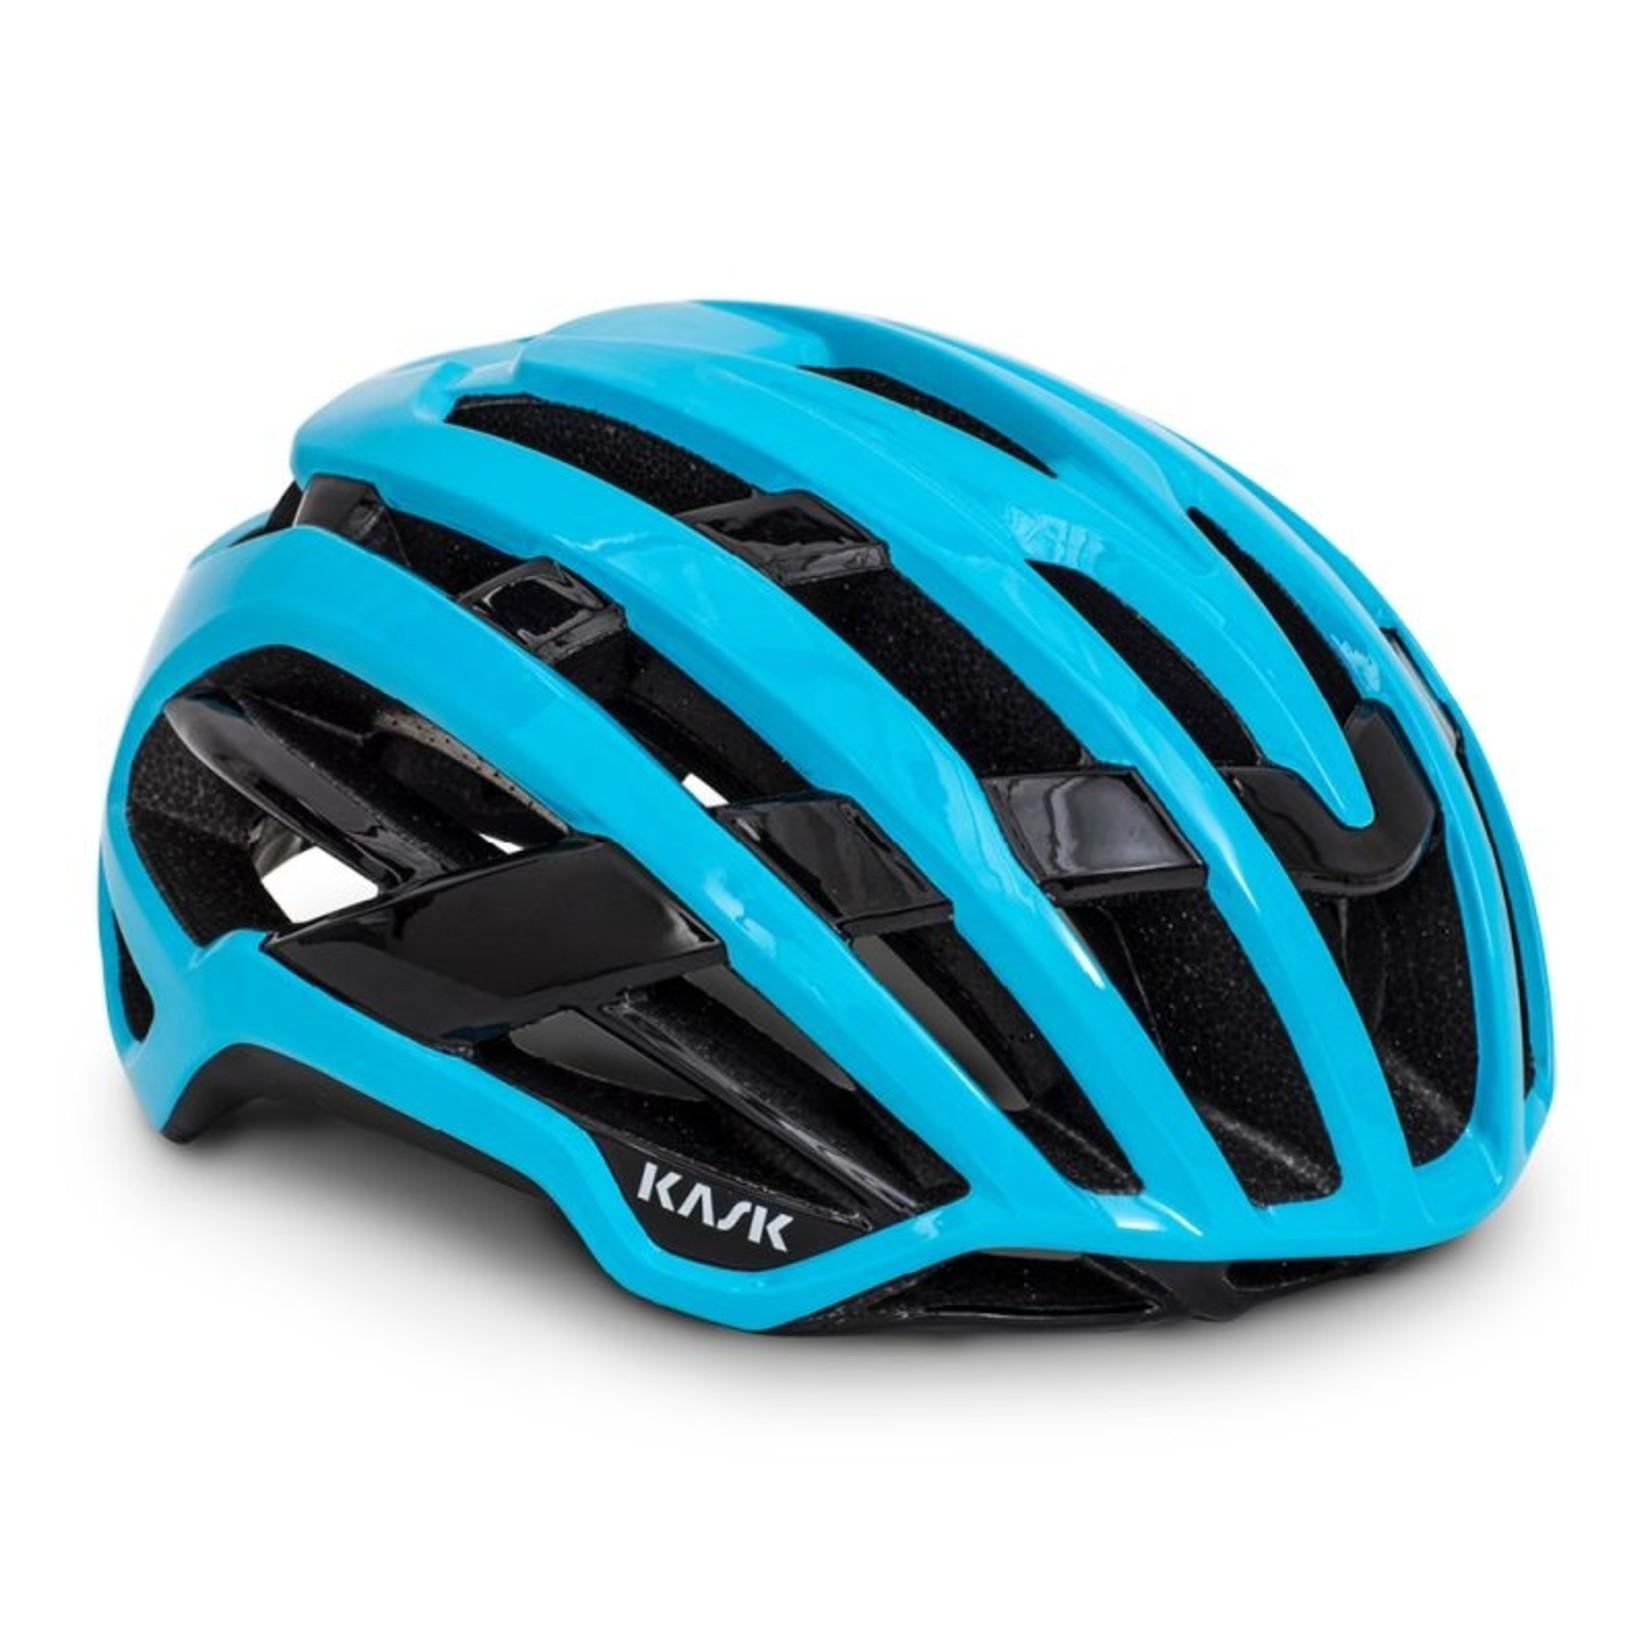 Kask Kask, Helmet Valegro